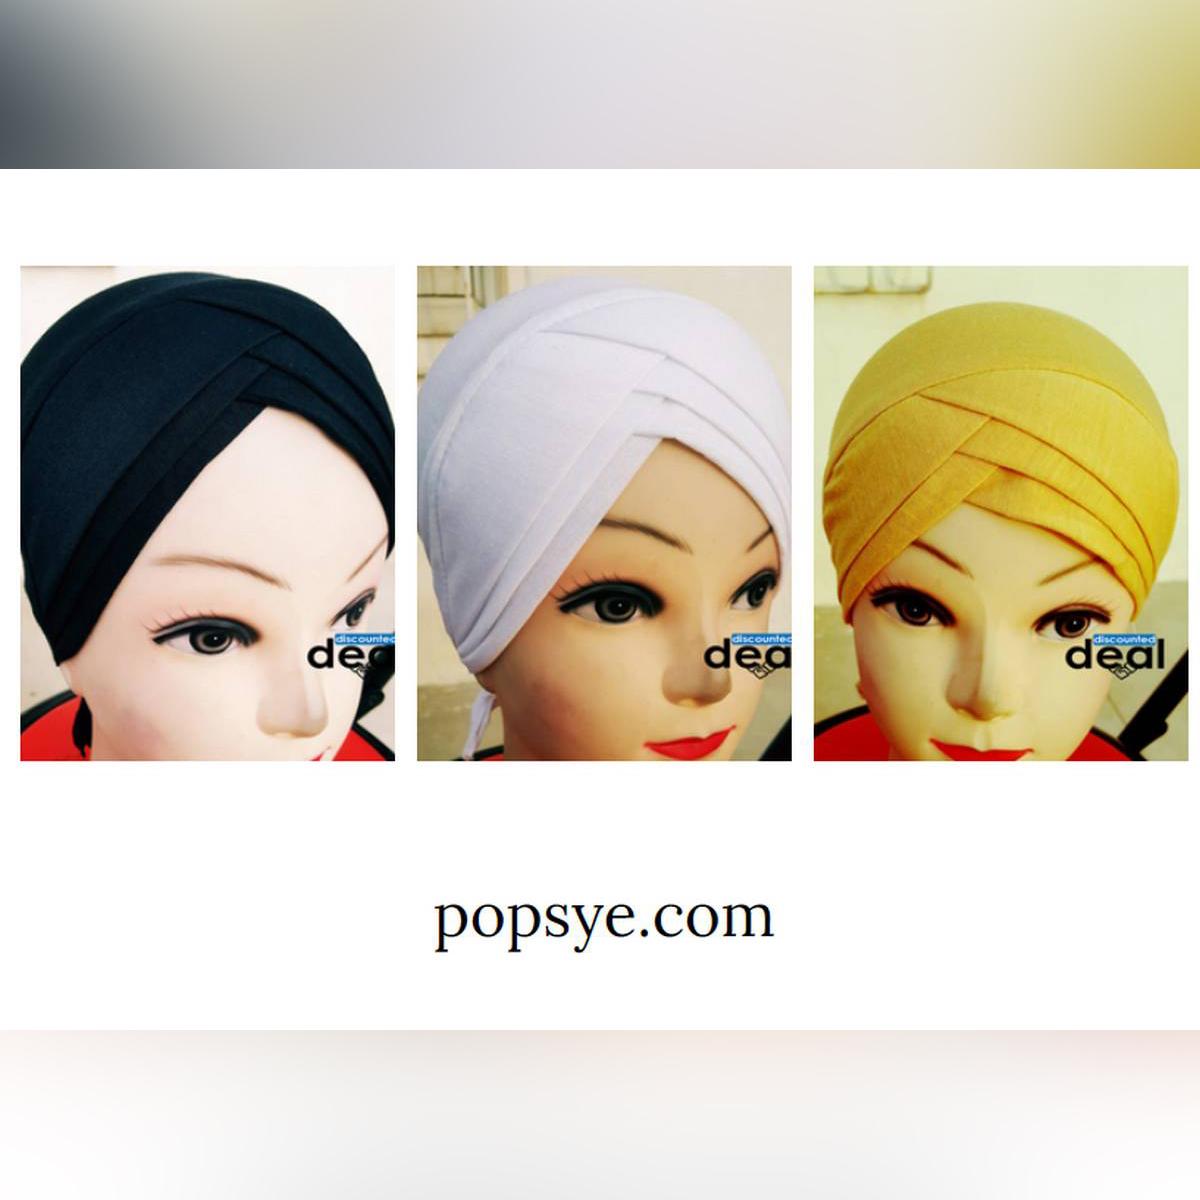 pack of 3 criss cross Plain Tube Muslim Headscarf Inner Hijab Caps Wraps Women Islamic Under Scarf Ninja Scarf Ramadan Stretch Cotton Bonnet Caps